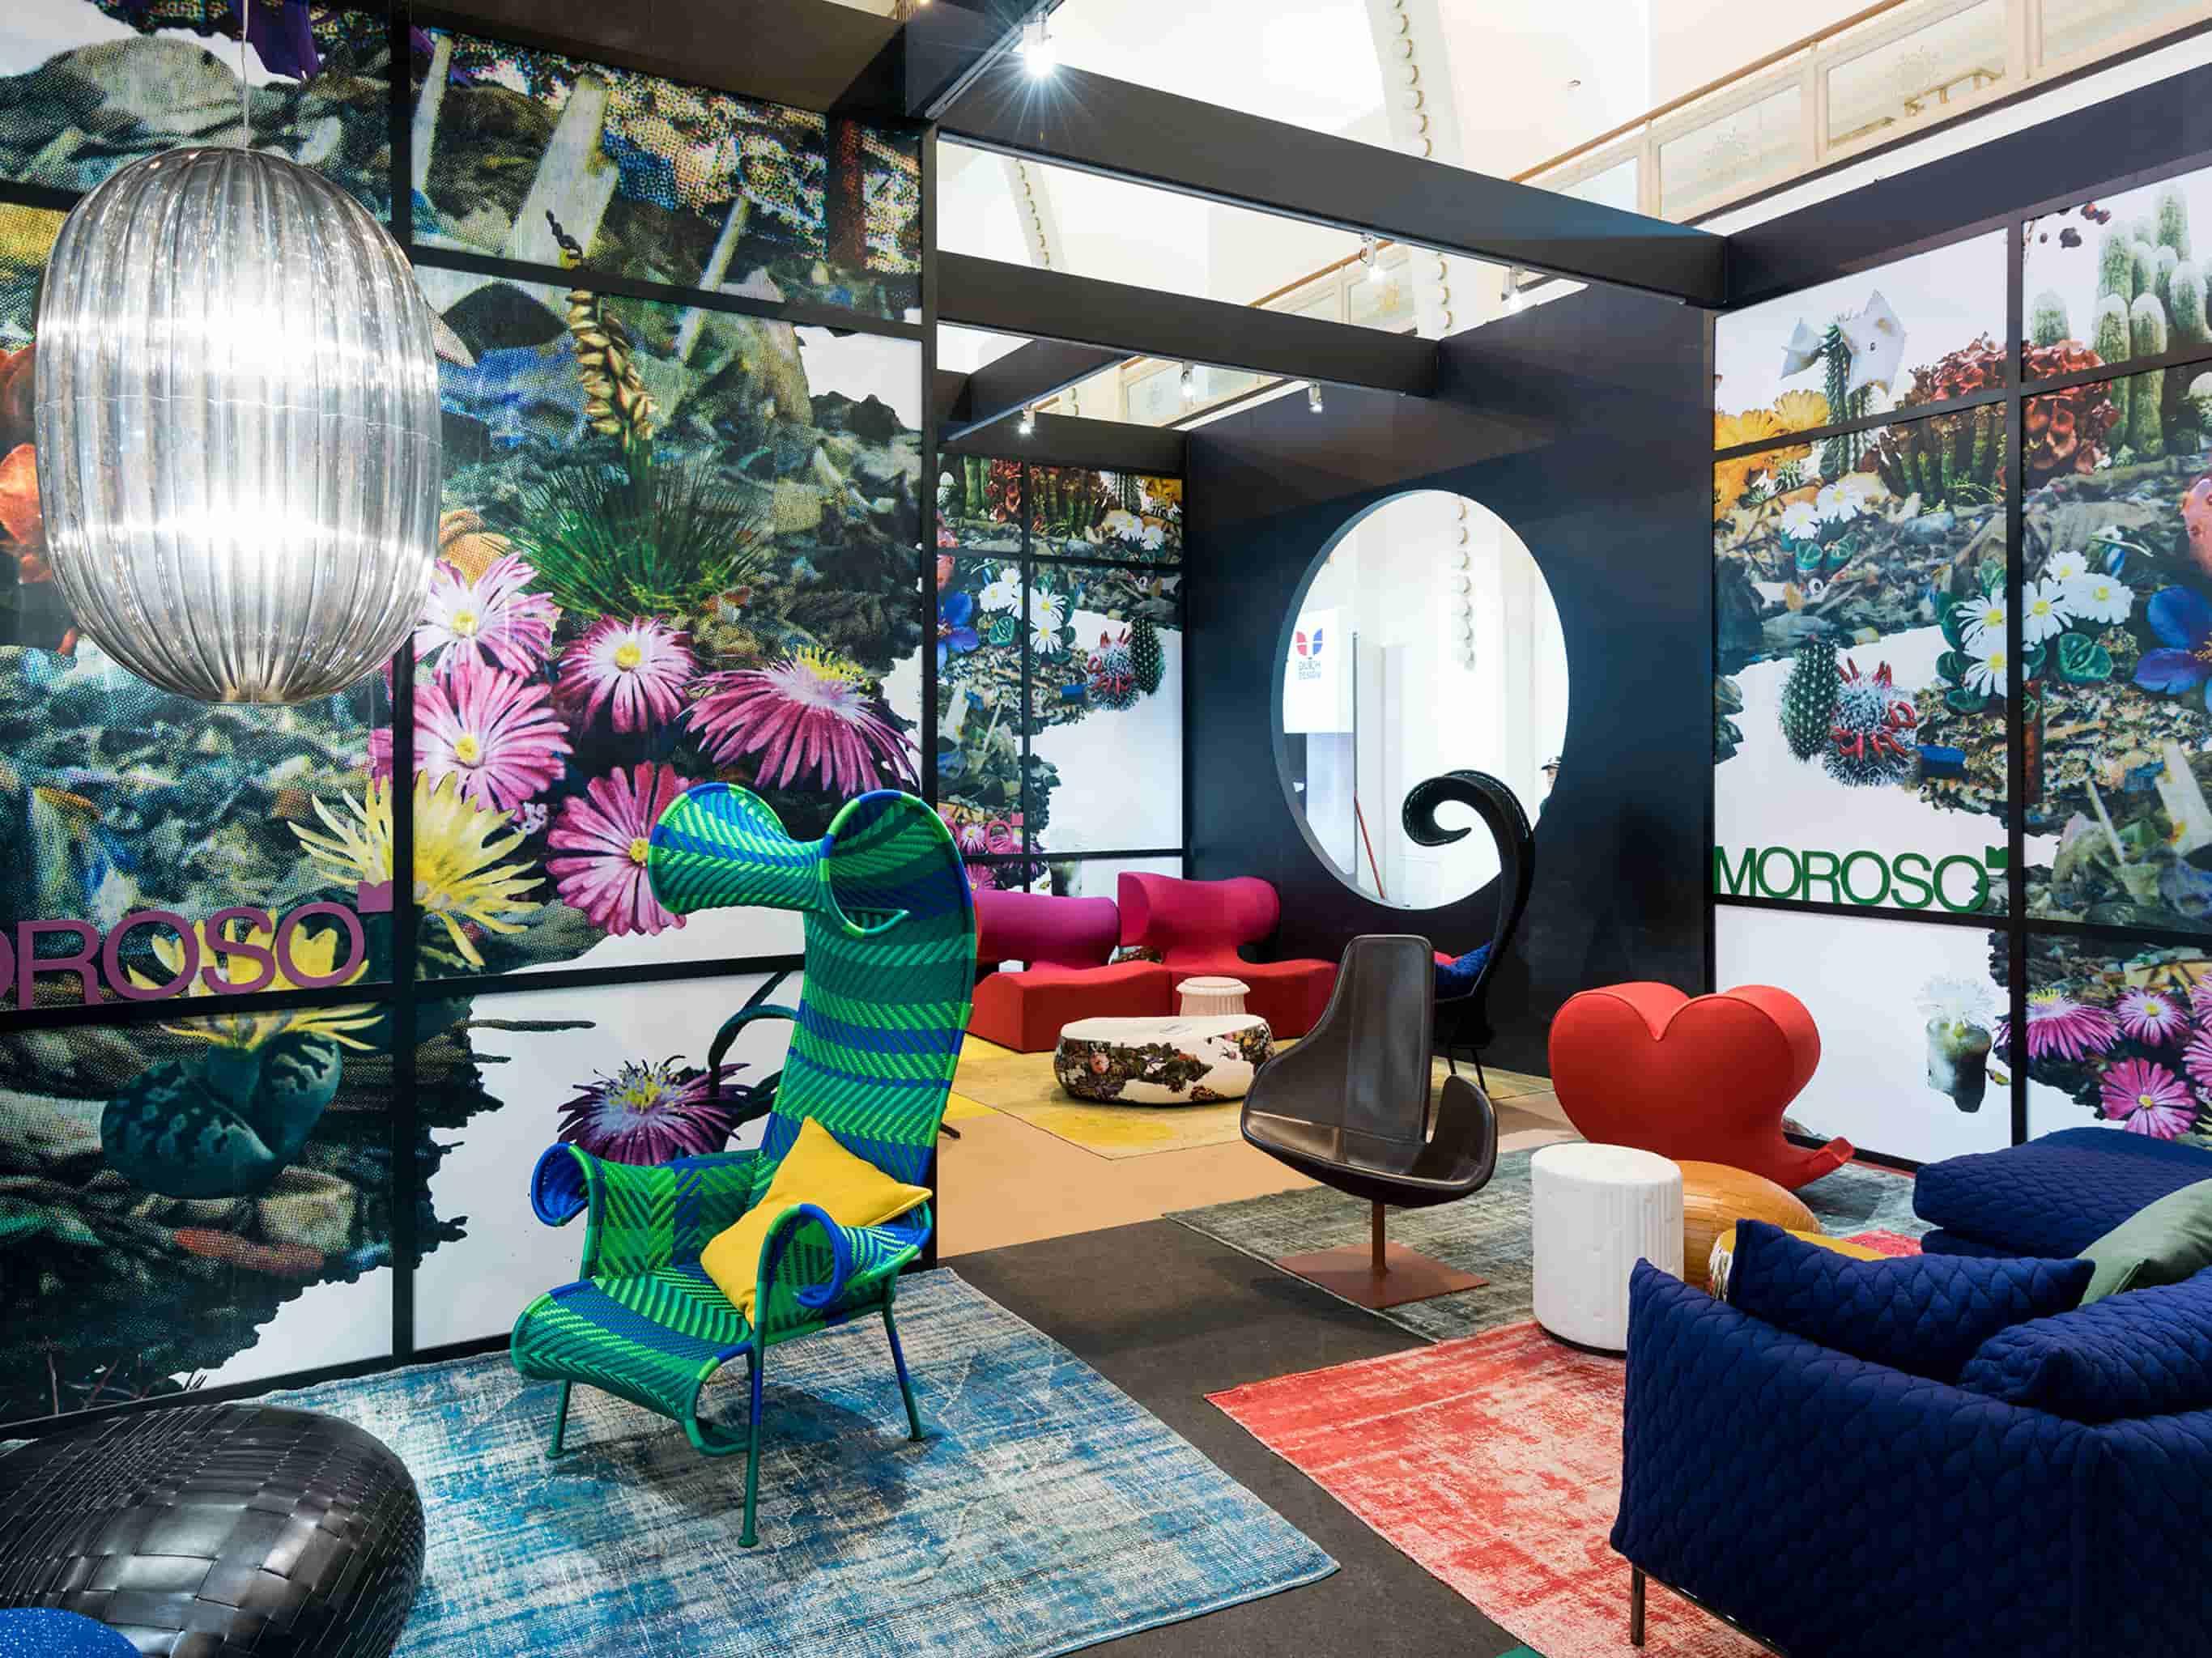 design shanghai 2019 Design Shanghai 2019 Design Shangai 2019 Event Guide Design Shanghai 2016 6 min